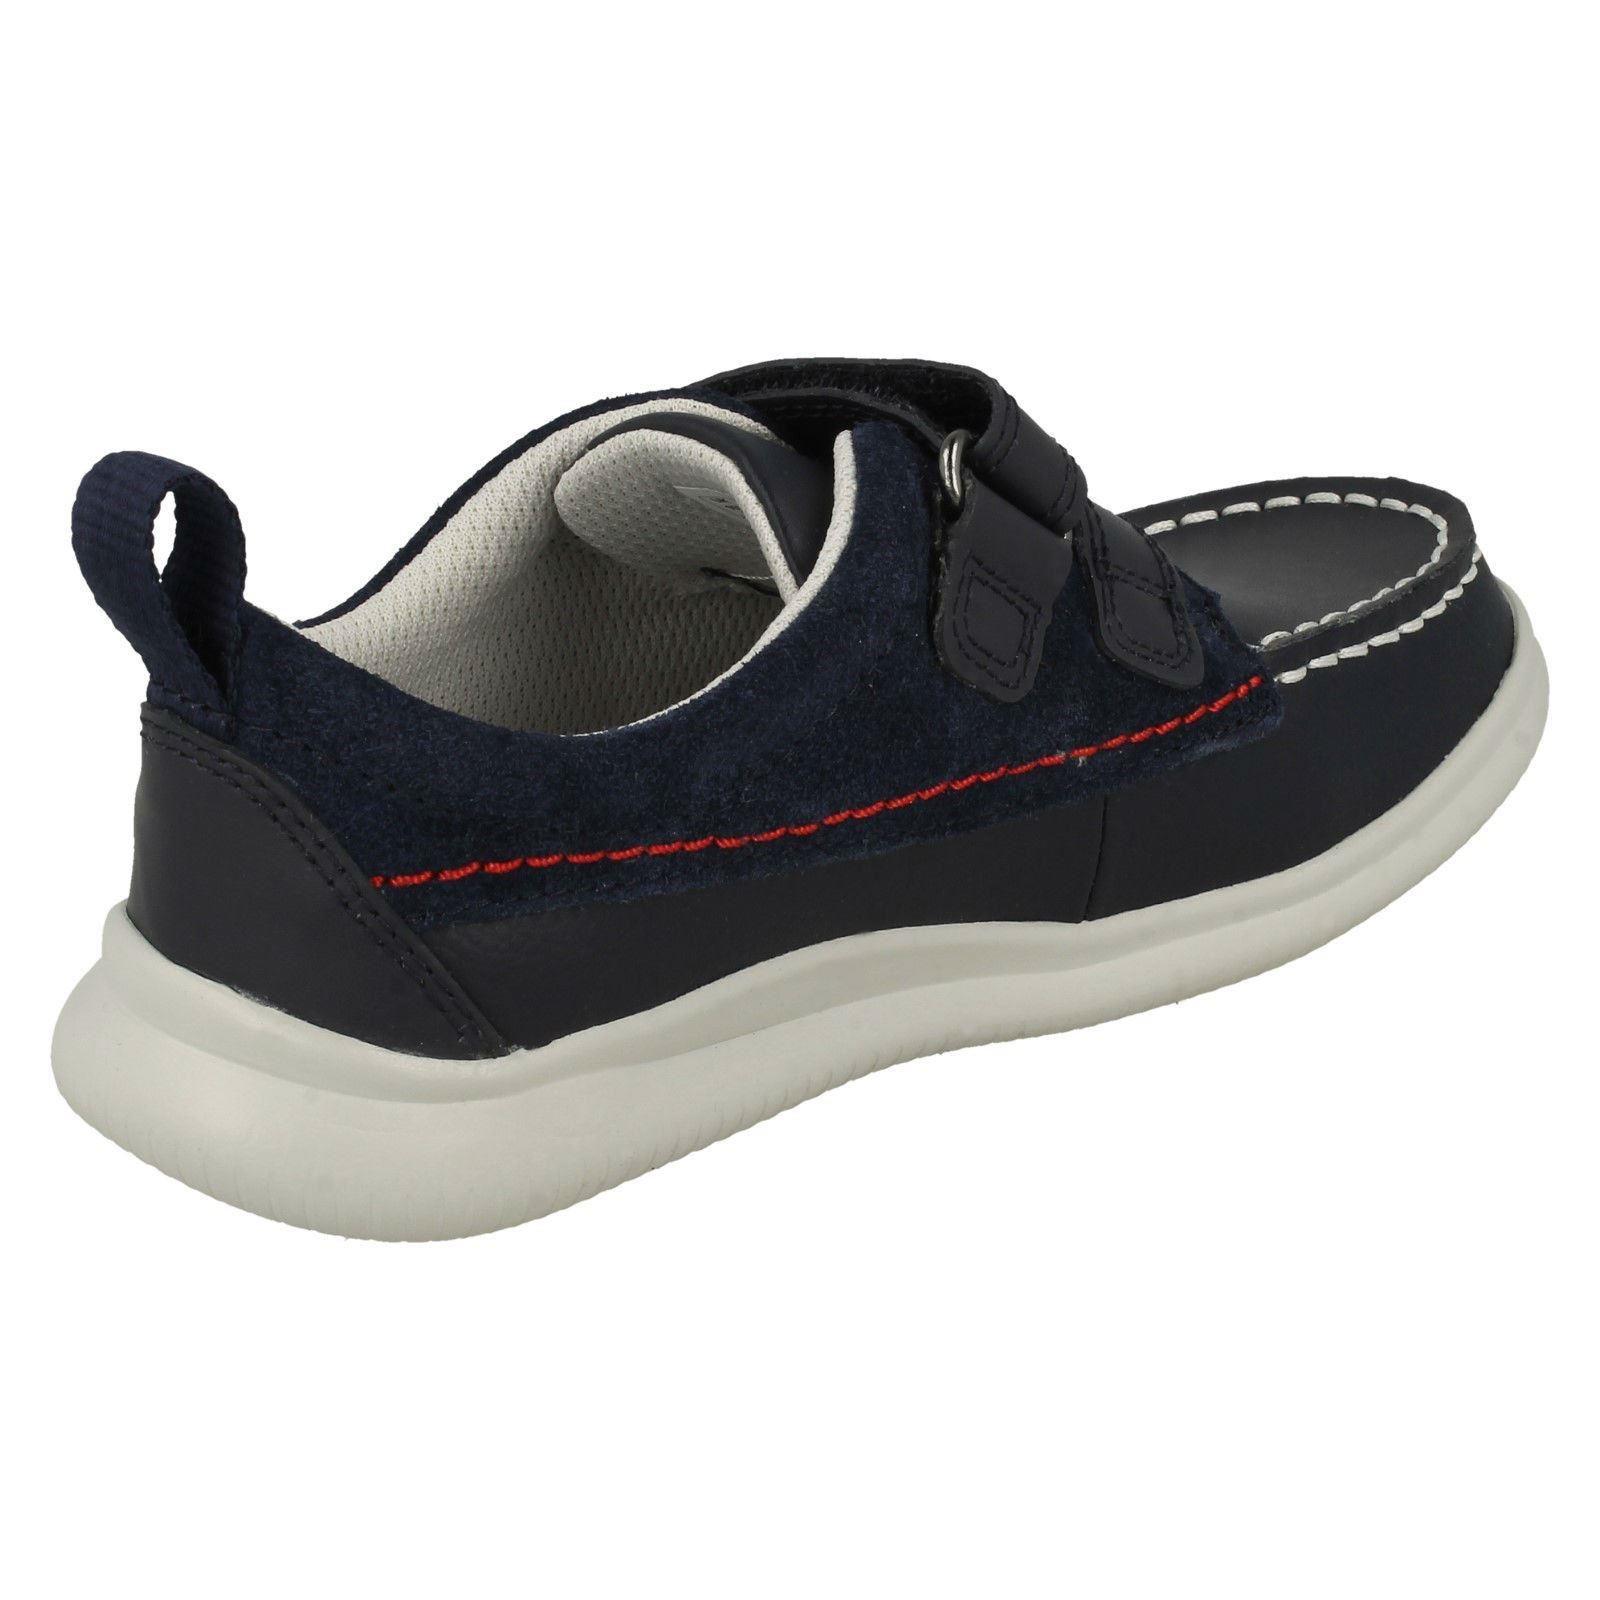 Details about  /Boys Clarks Casual Light Weight Shoes Cloud Art K